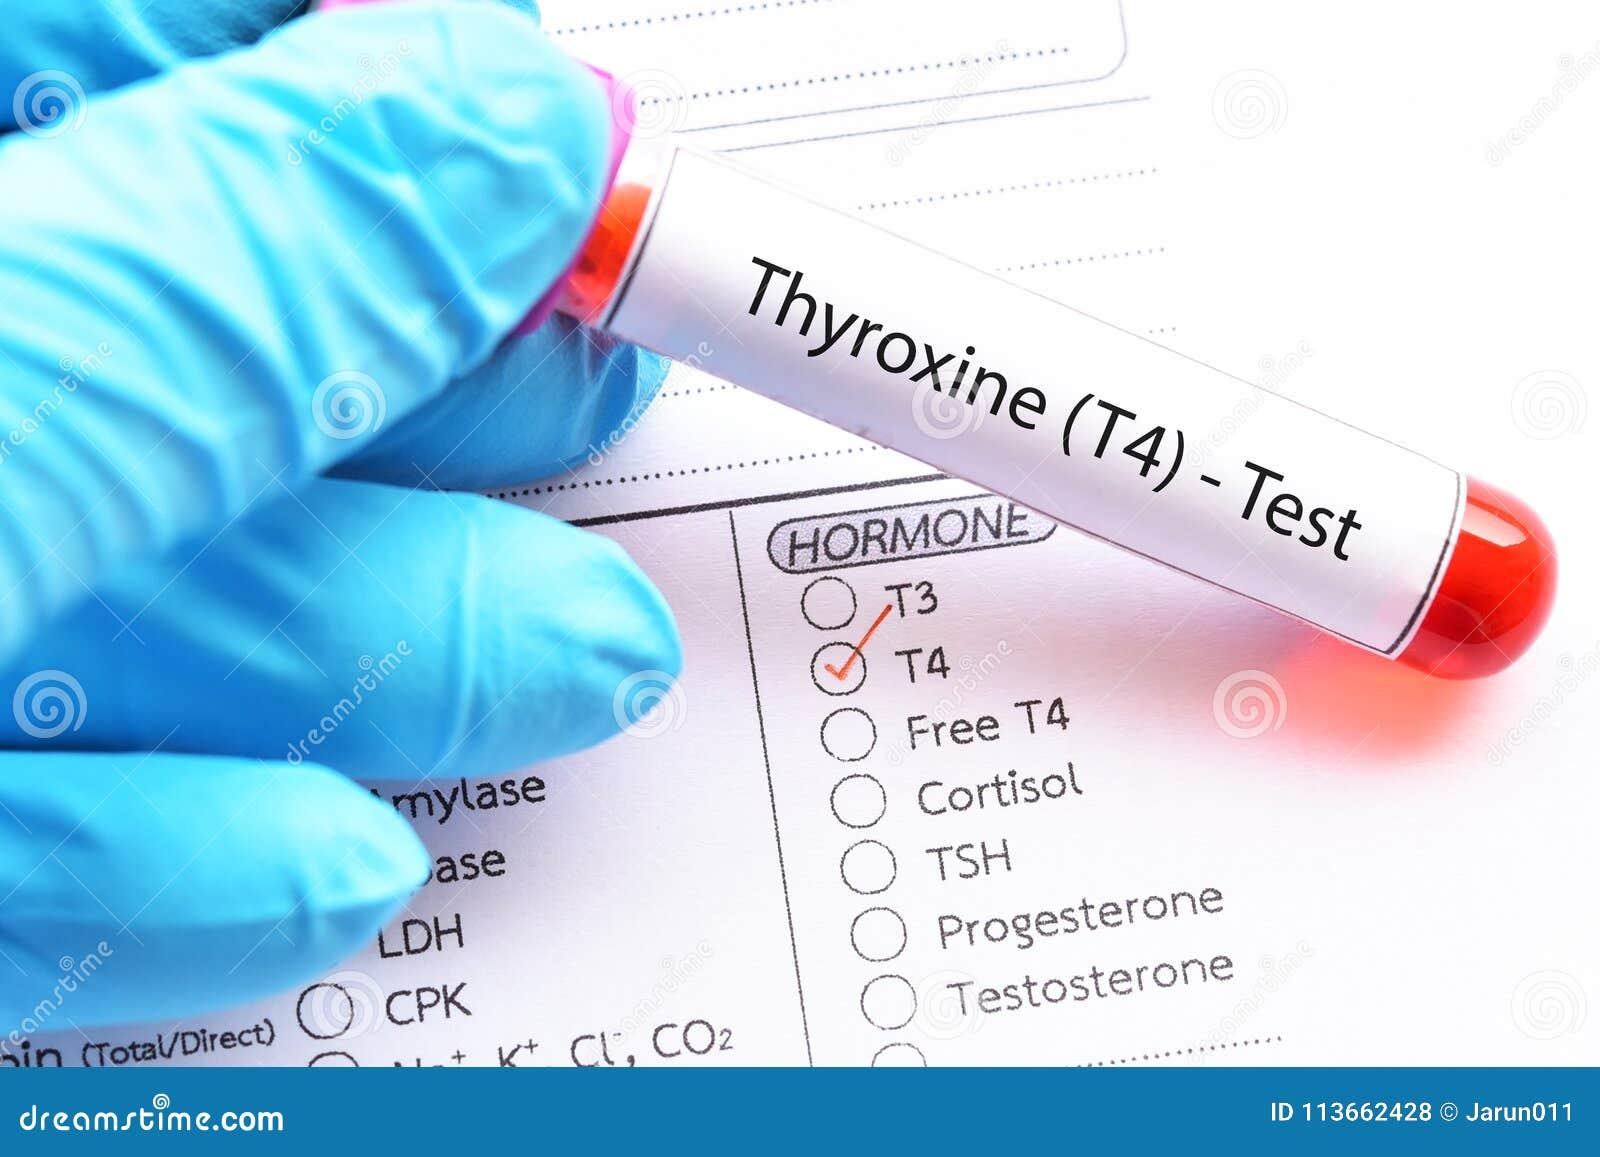 Thyroxine Hormone Test Stock Photo Image Of Hyperthyroidism